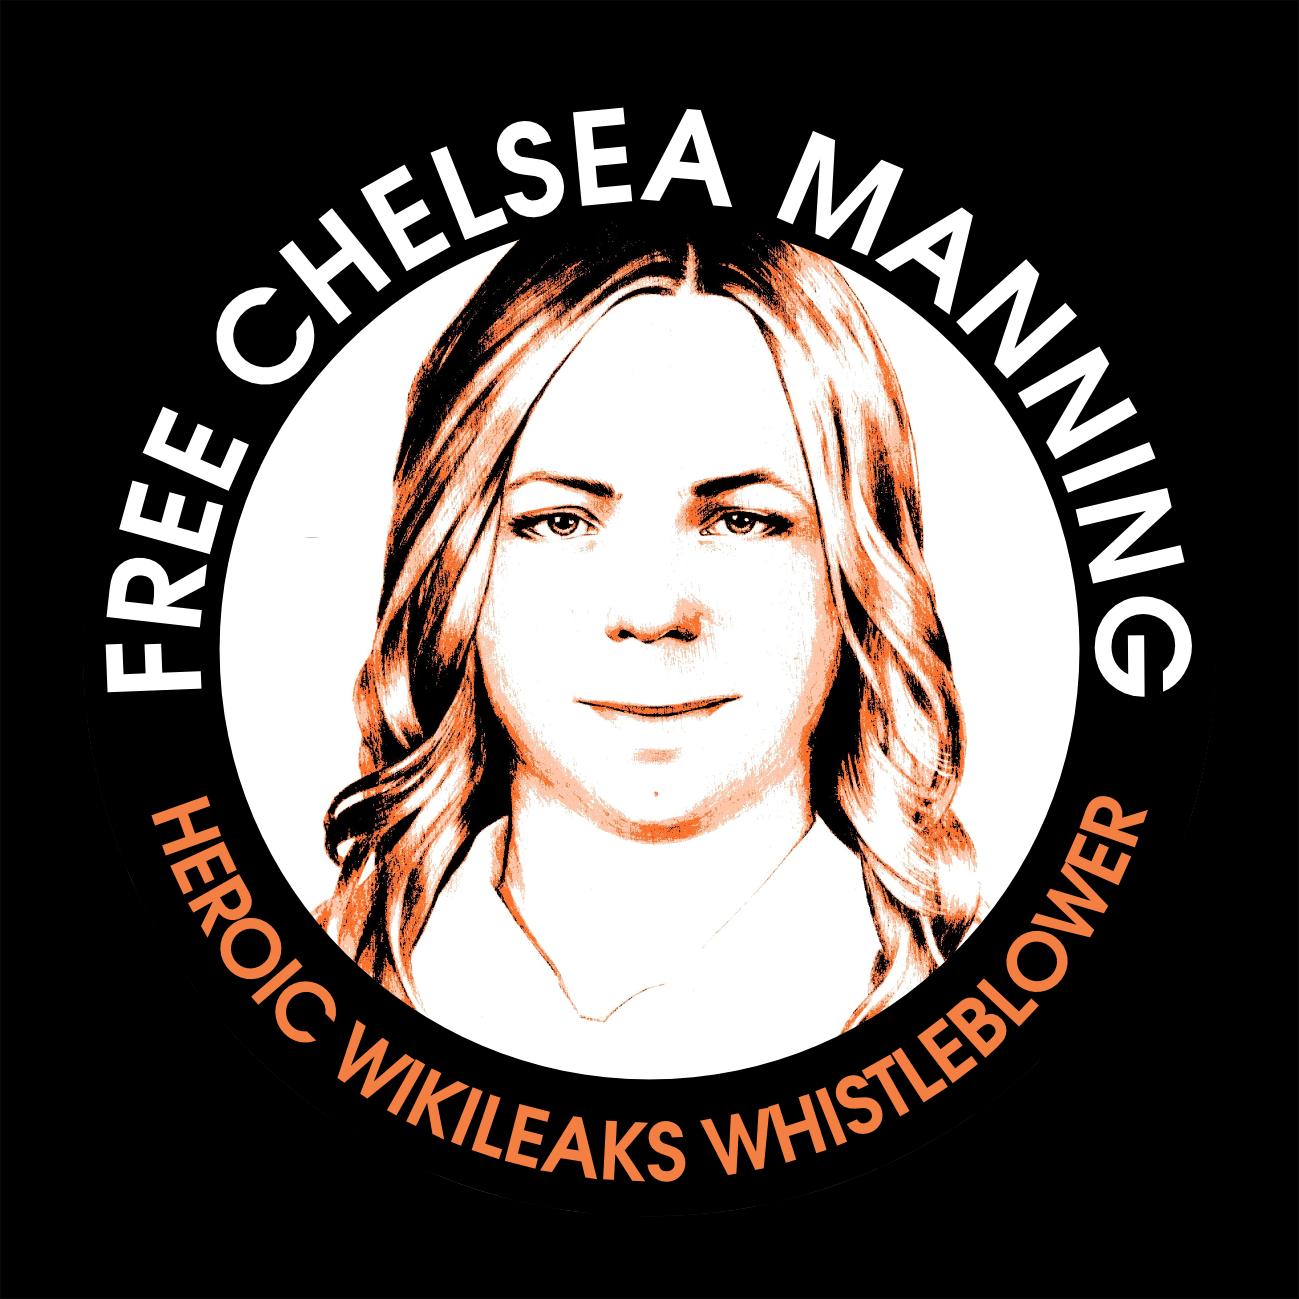 free chelsea manning - heroic wikileaks whistleblower